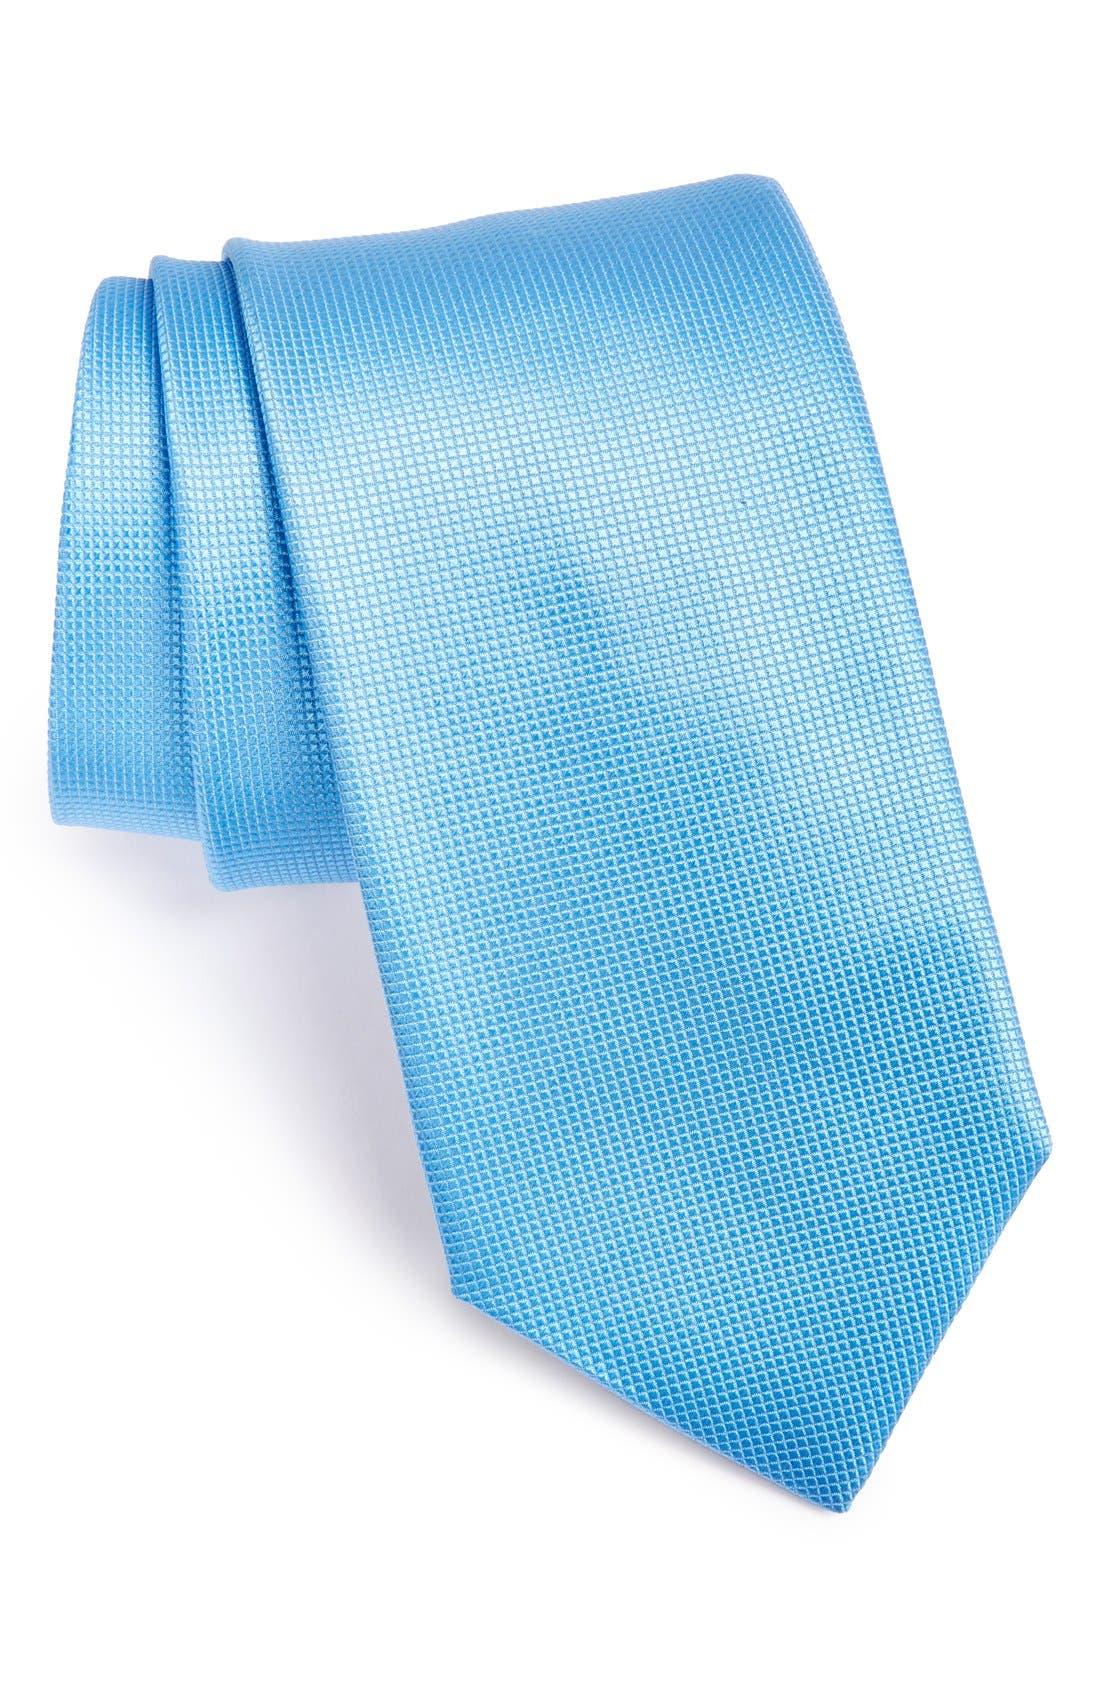 Alternate Image 1 Selected - BOSS Woven Silk Tie